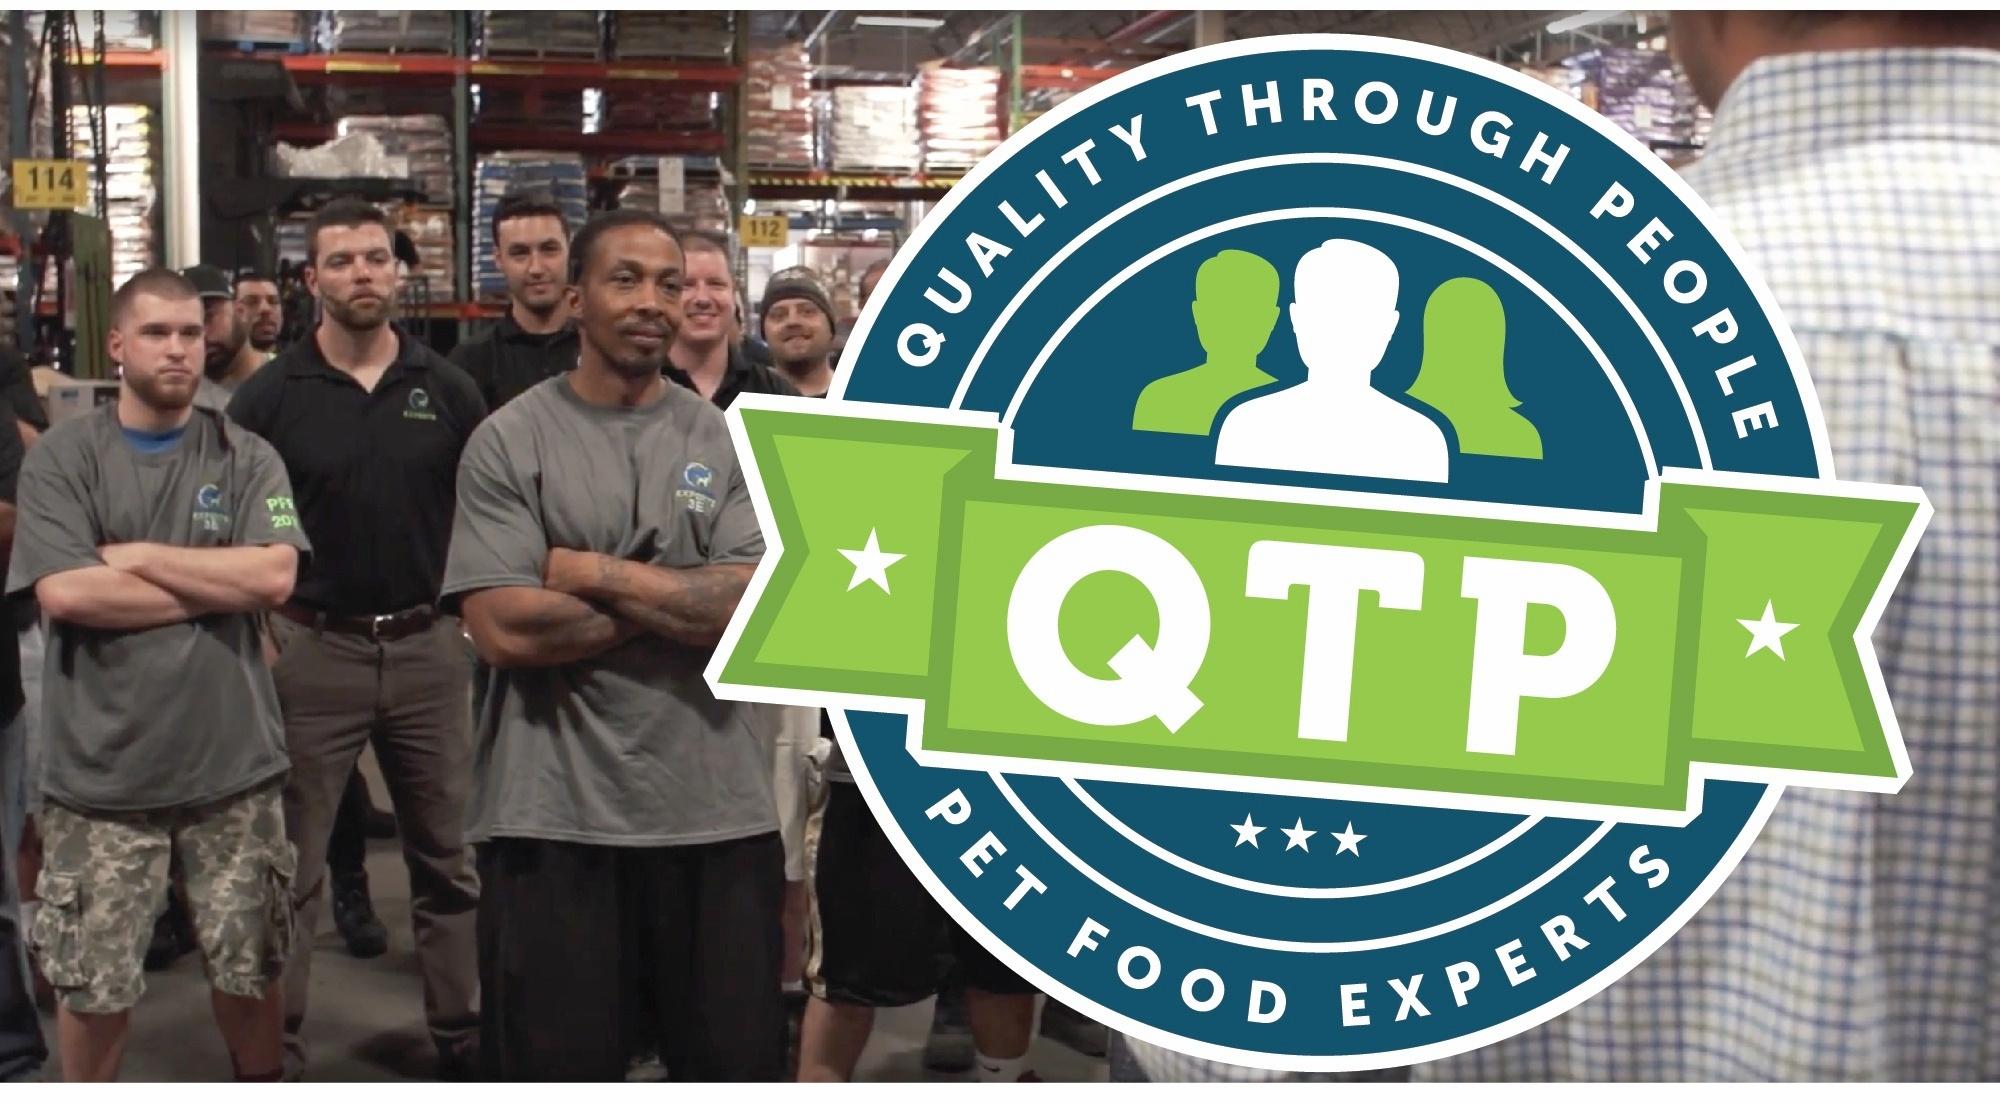 QTP-Group-Image-01-436024-edited.jpg